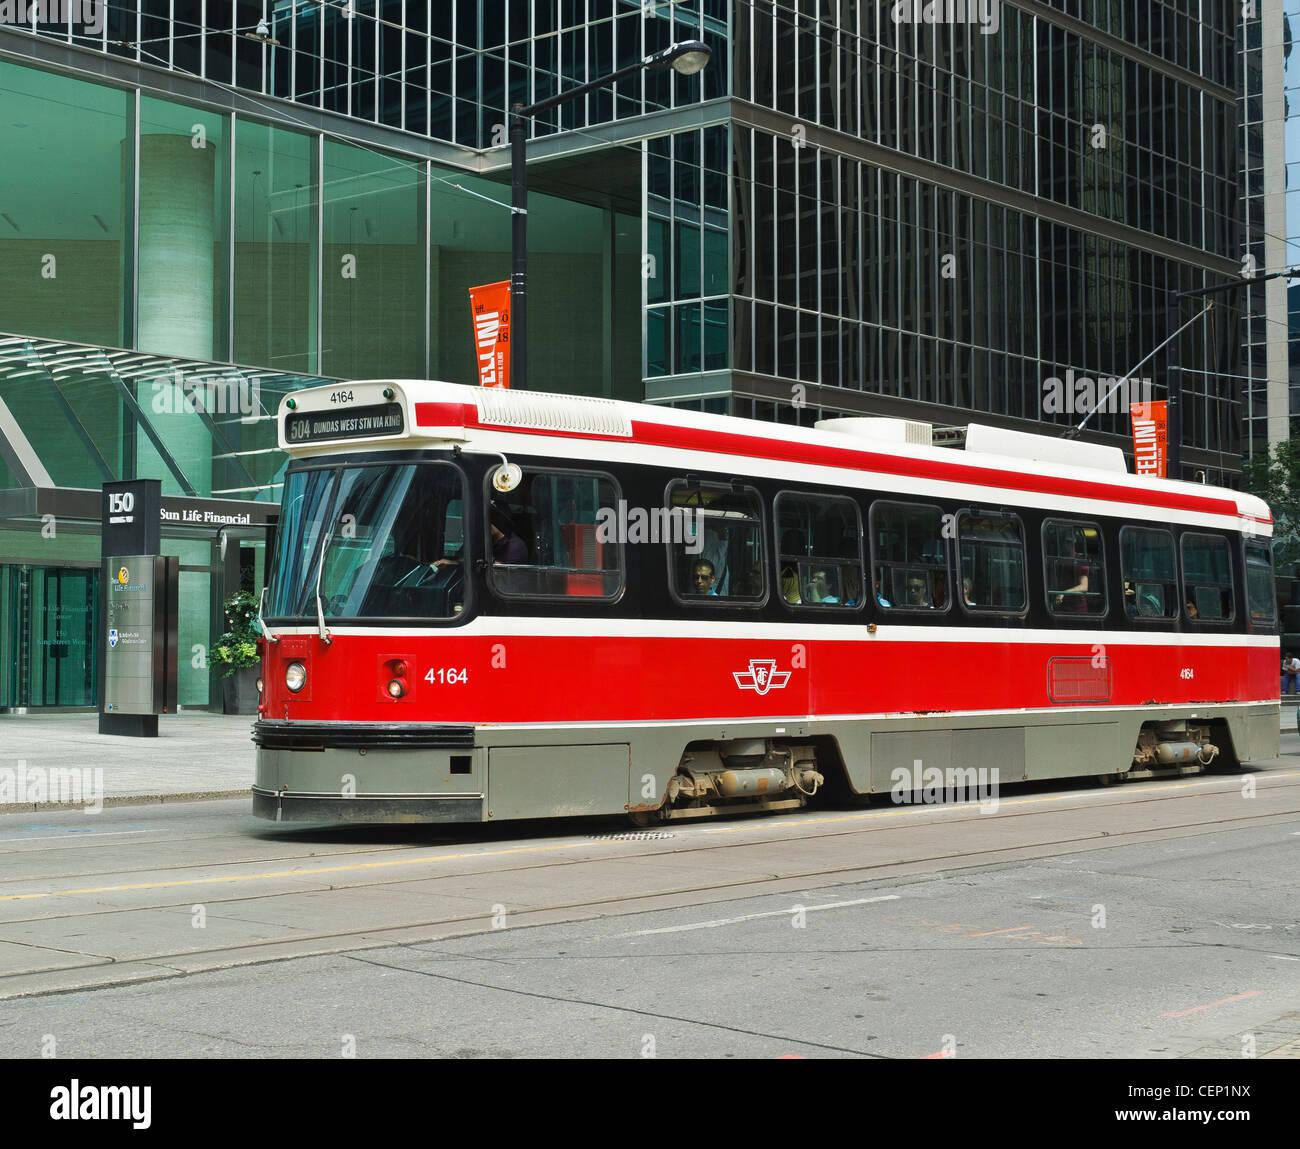 Toronto Streetcar,known as the Red Rocket,Ontario, Canada - Stock Image